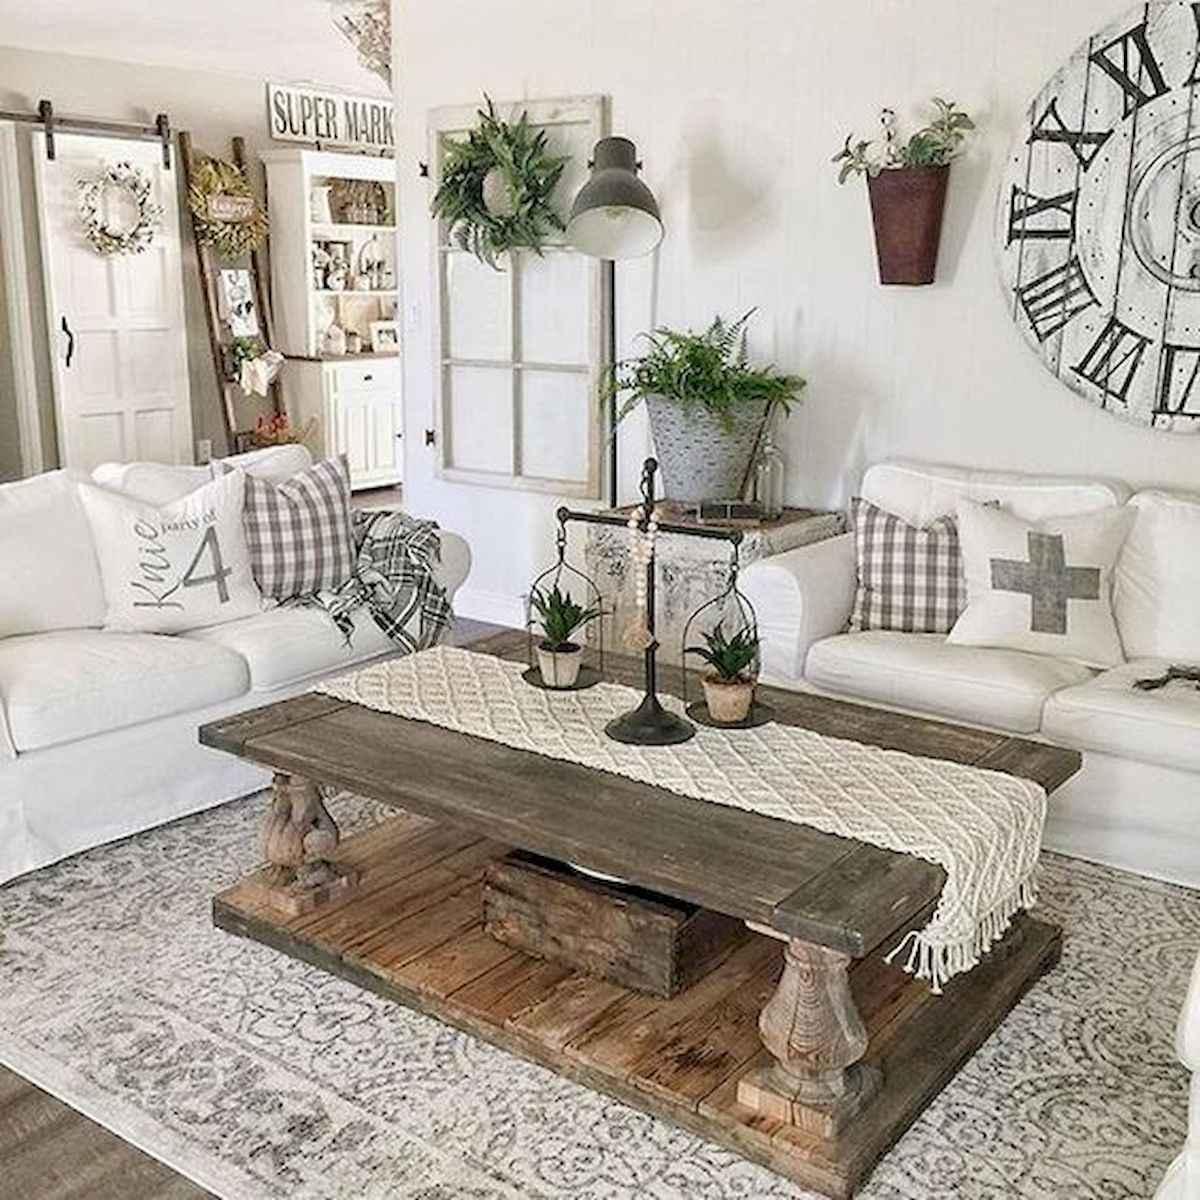 80 Elegant Furniture For Modern Farmhouse Living Room Decor Ideas (51)